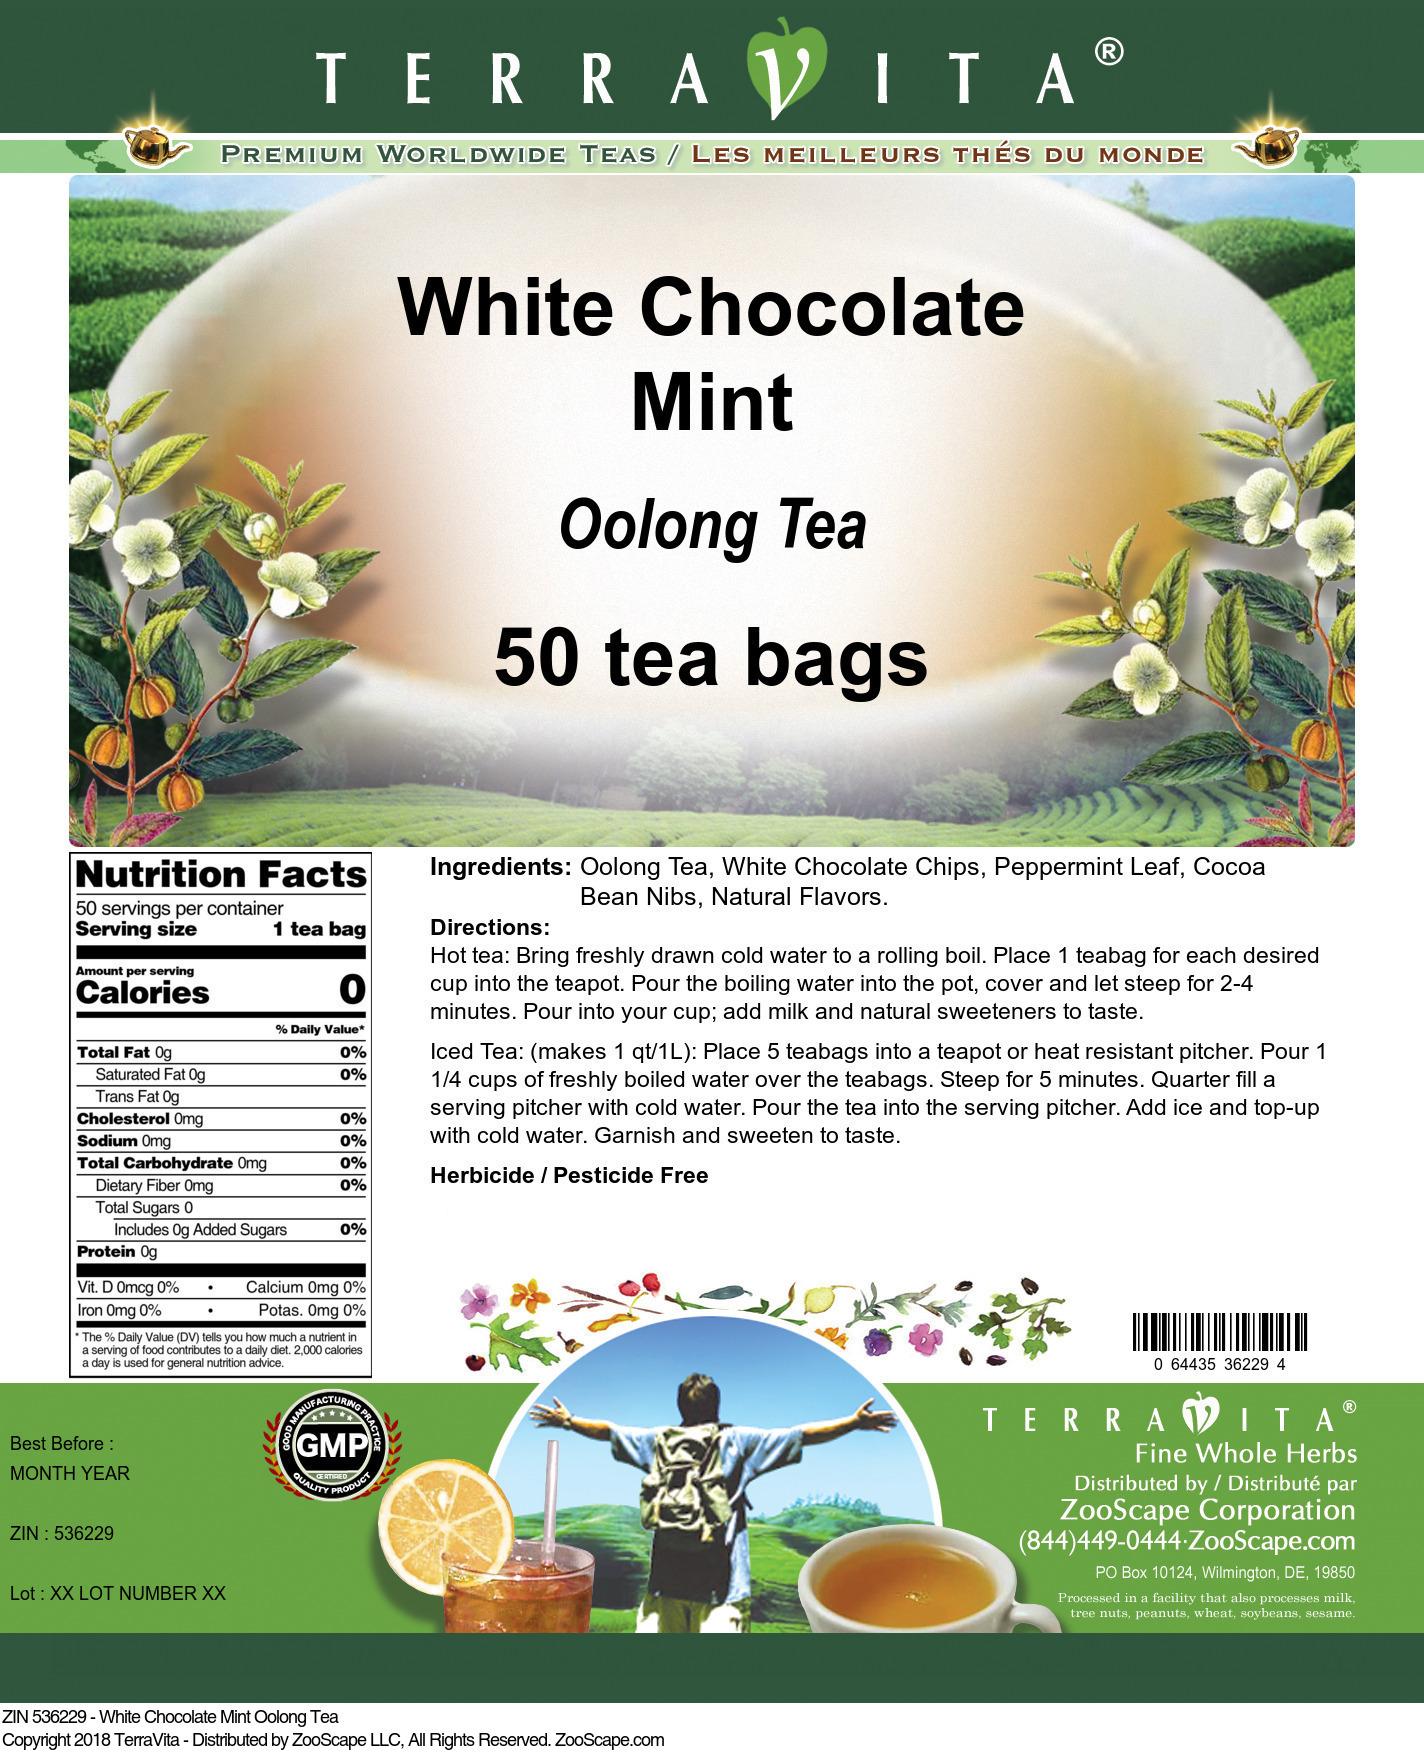 White Chocolate Mint Oolong Tea